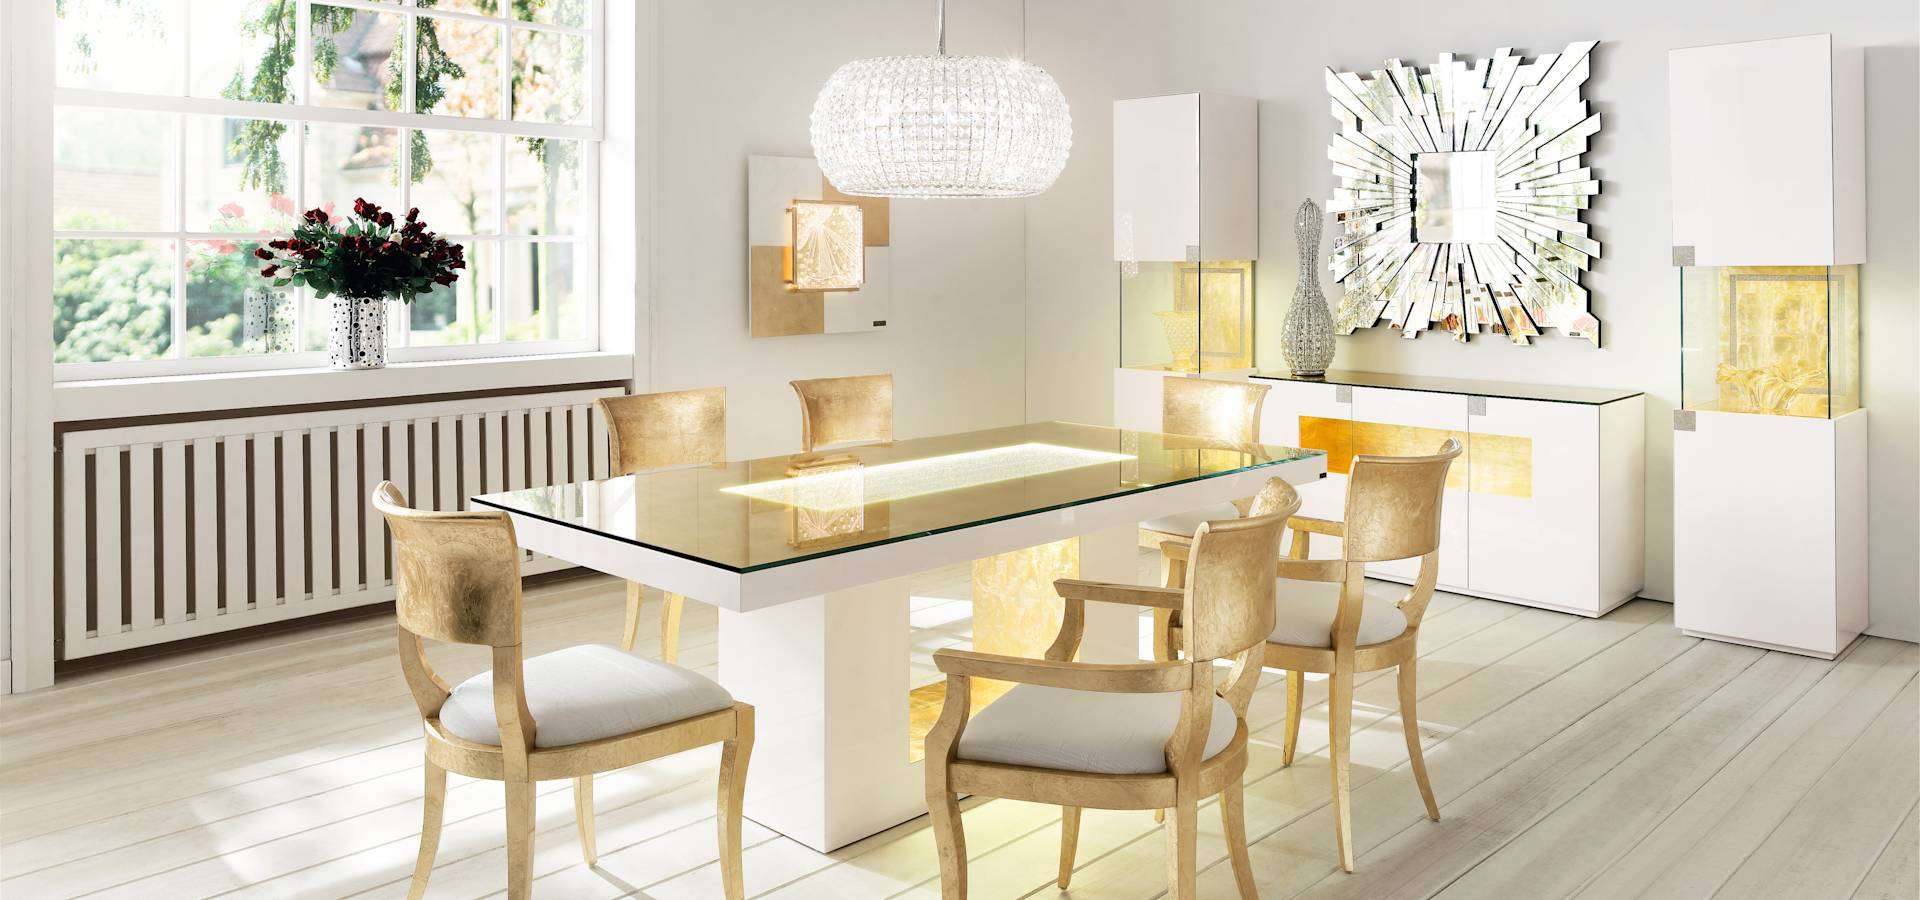 finkeldei polsterm bel gmbh textilien polsterarbeiten. Black Bedroom Furniture Sets. Home Design Ideas